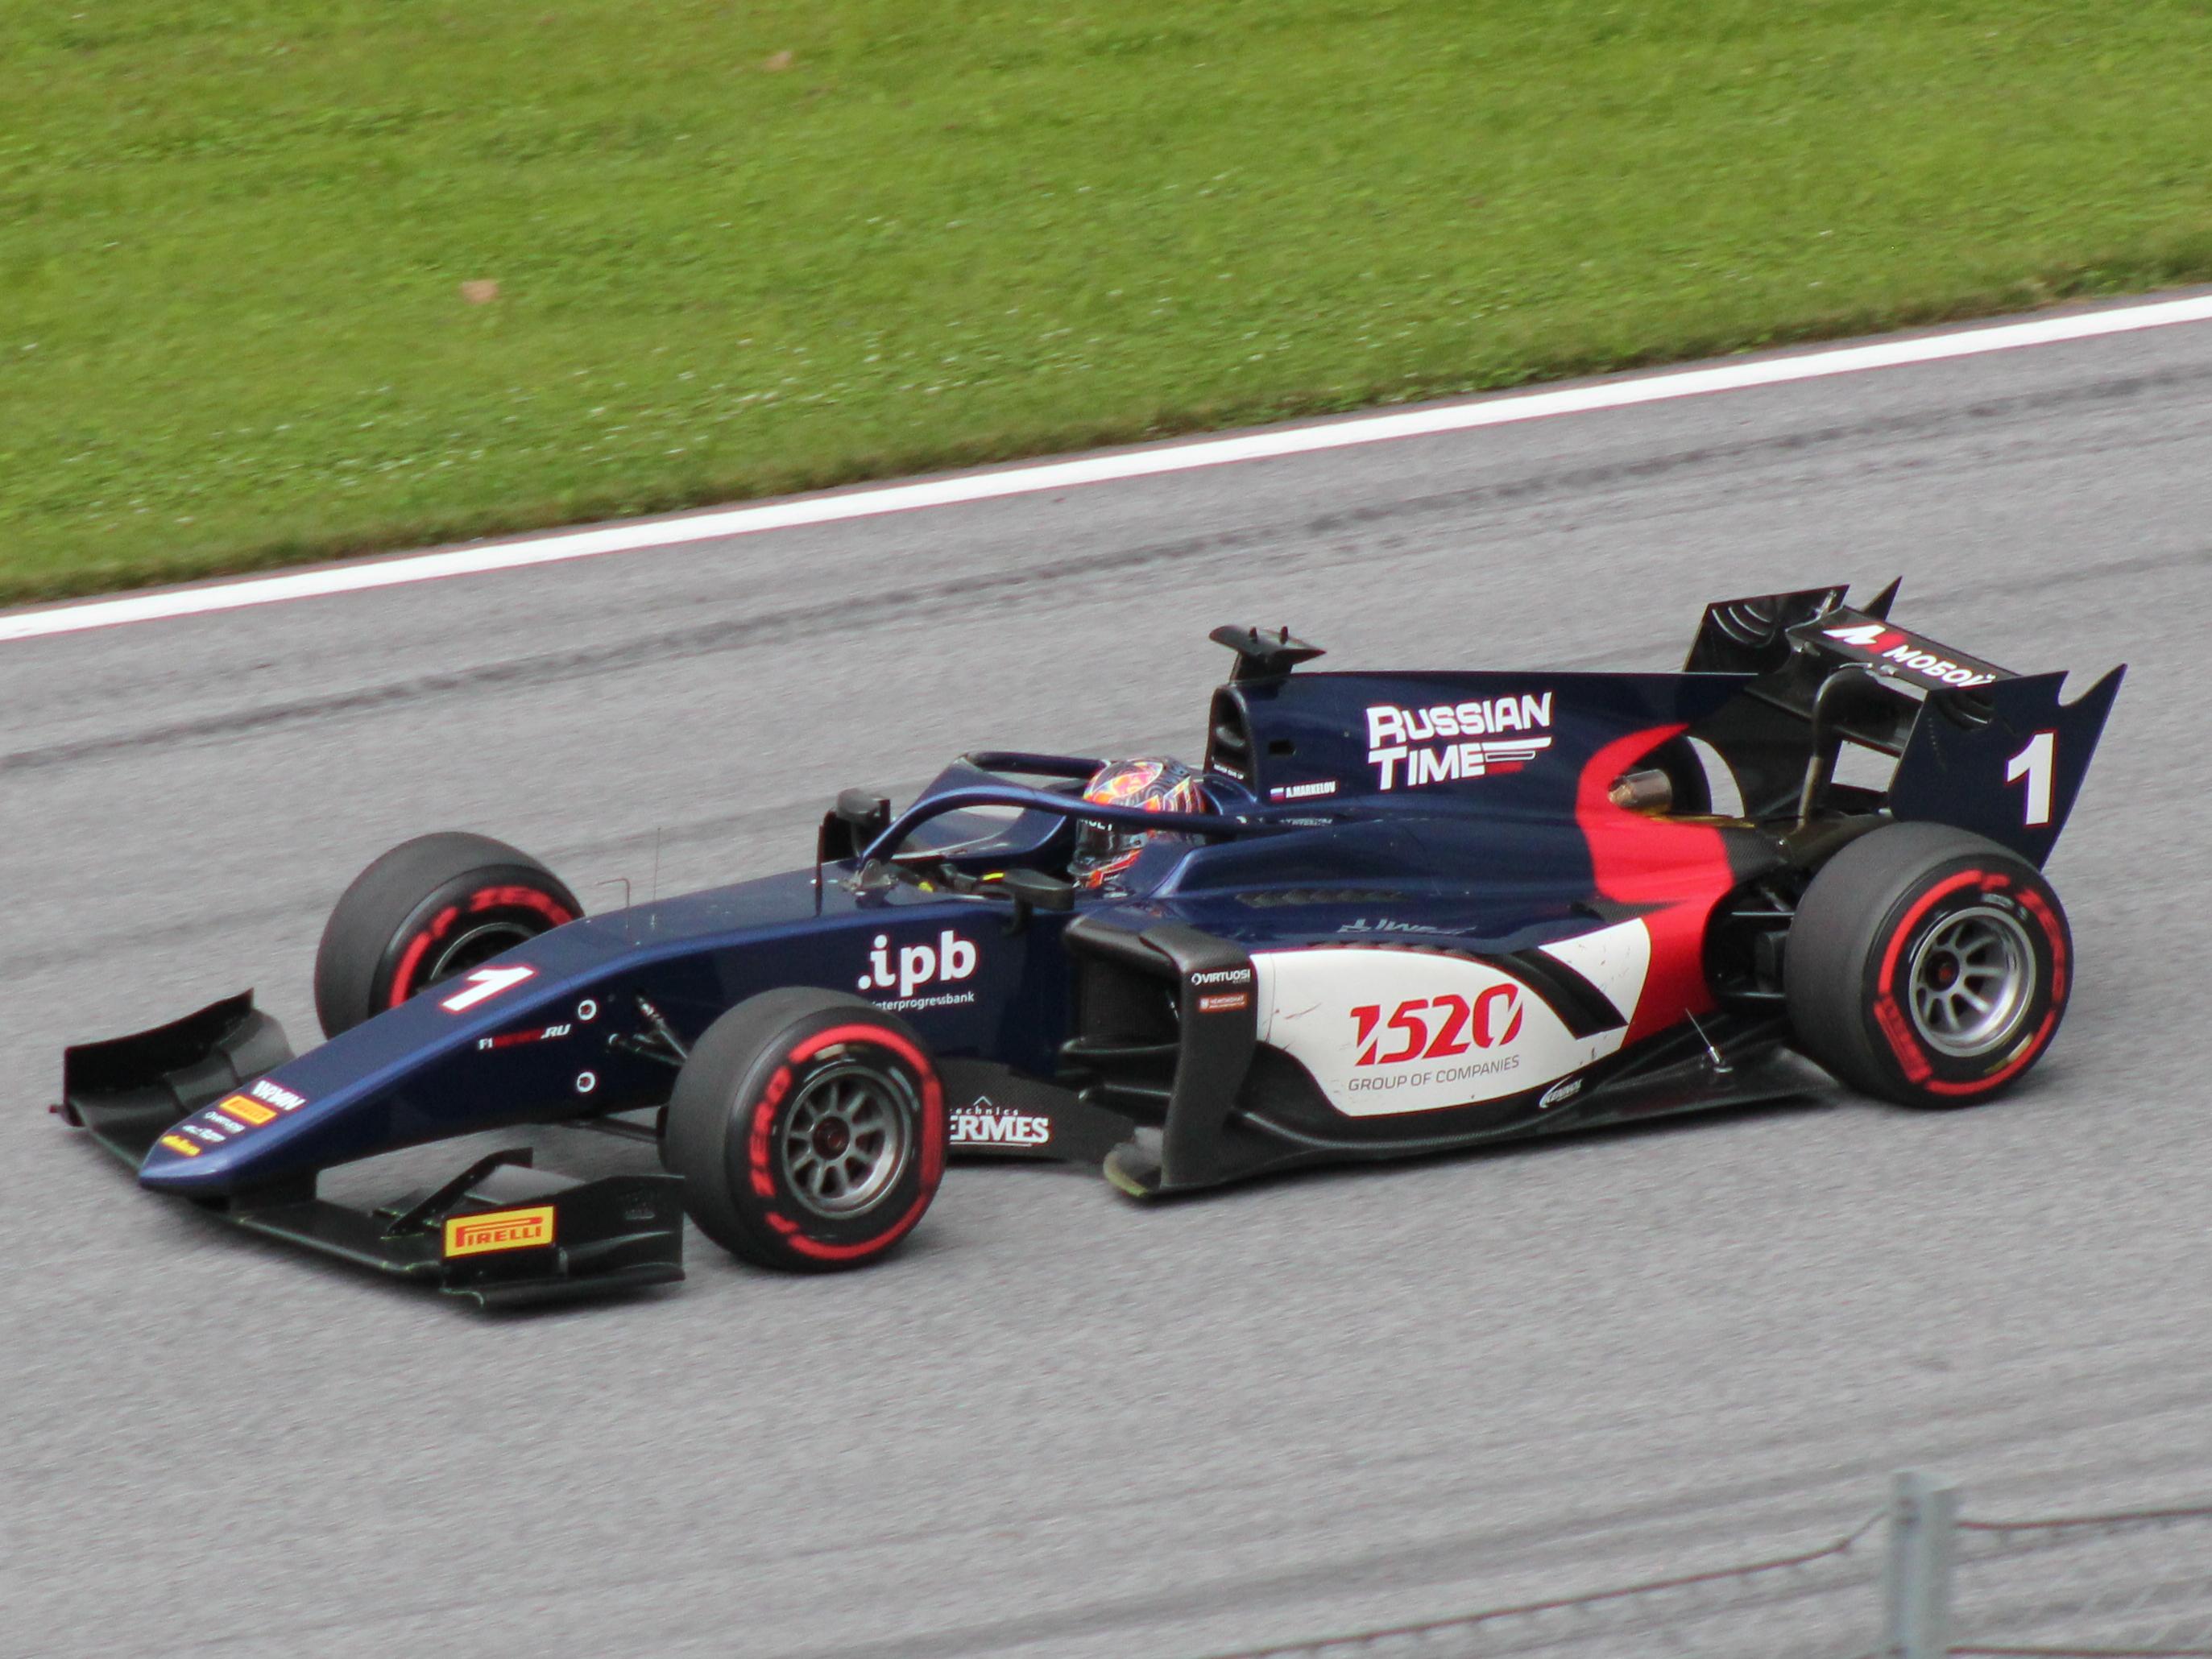 Dallara F2 2018 - Wikipedia